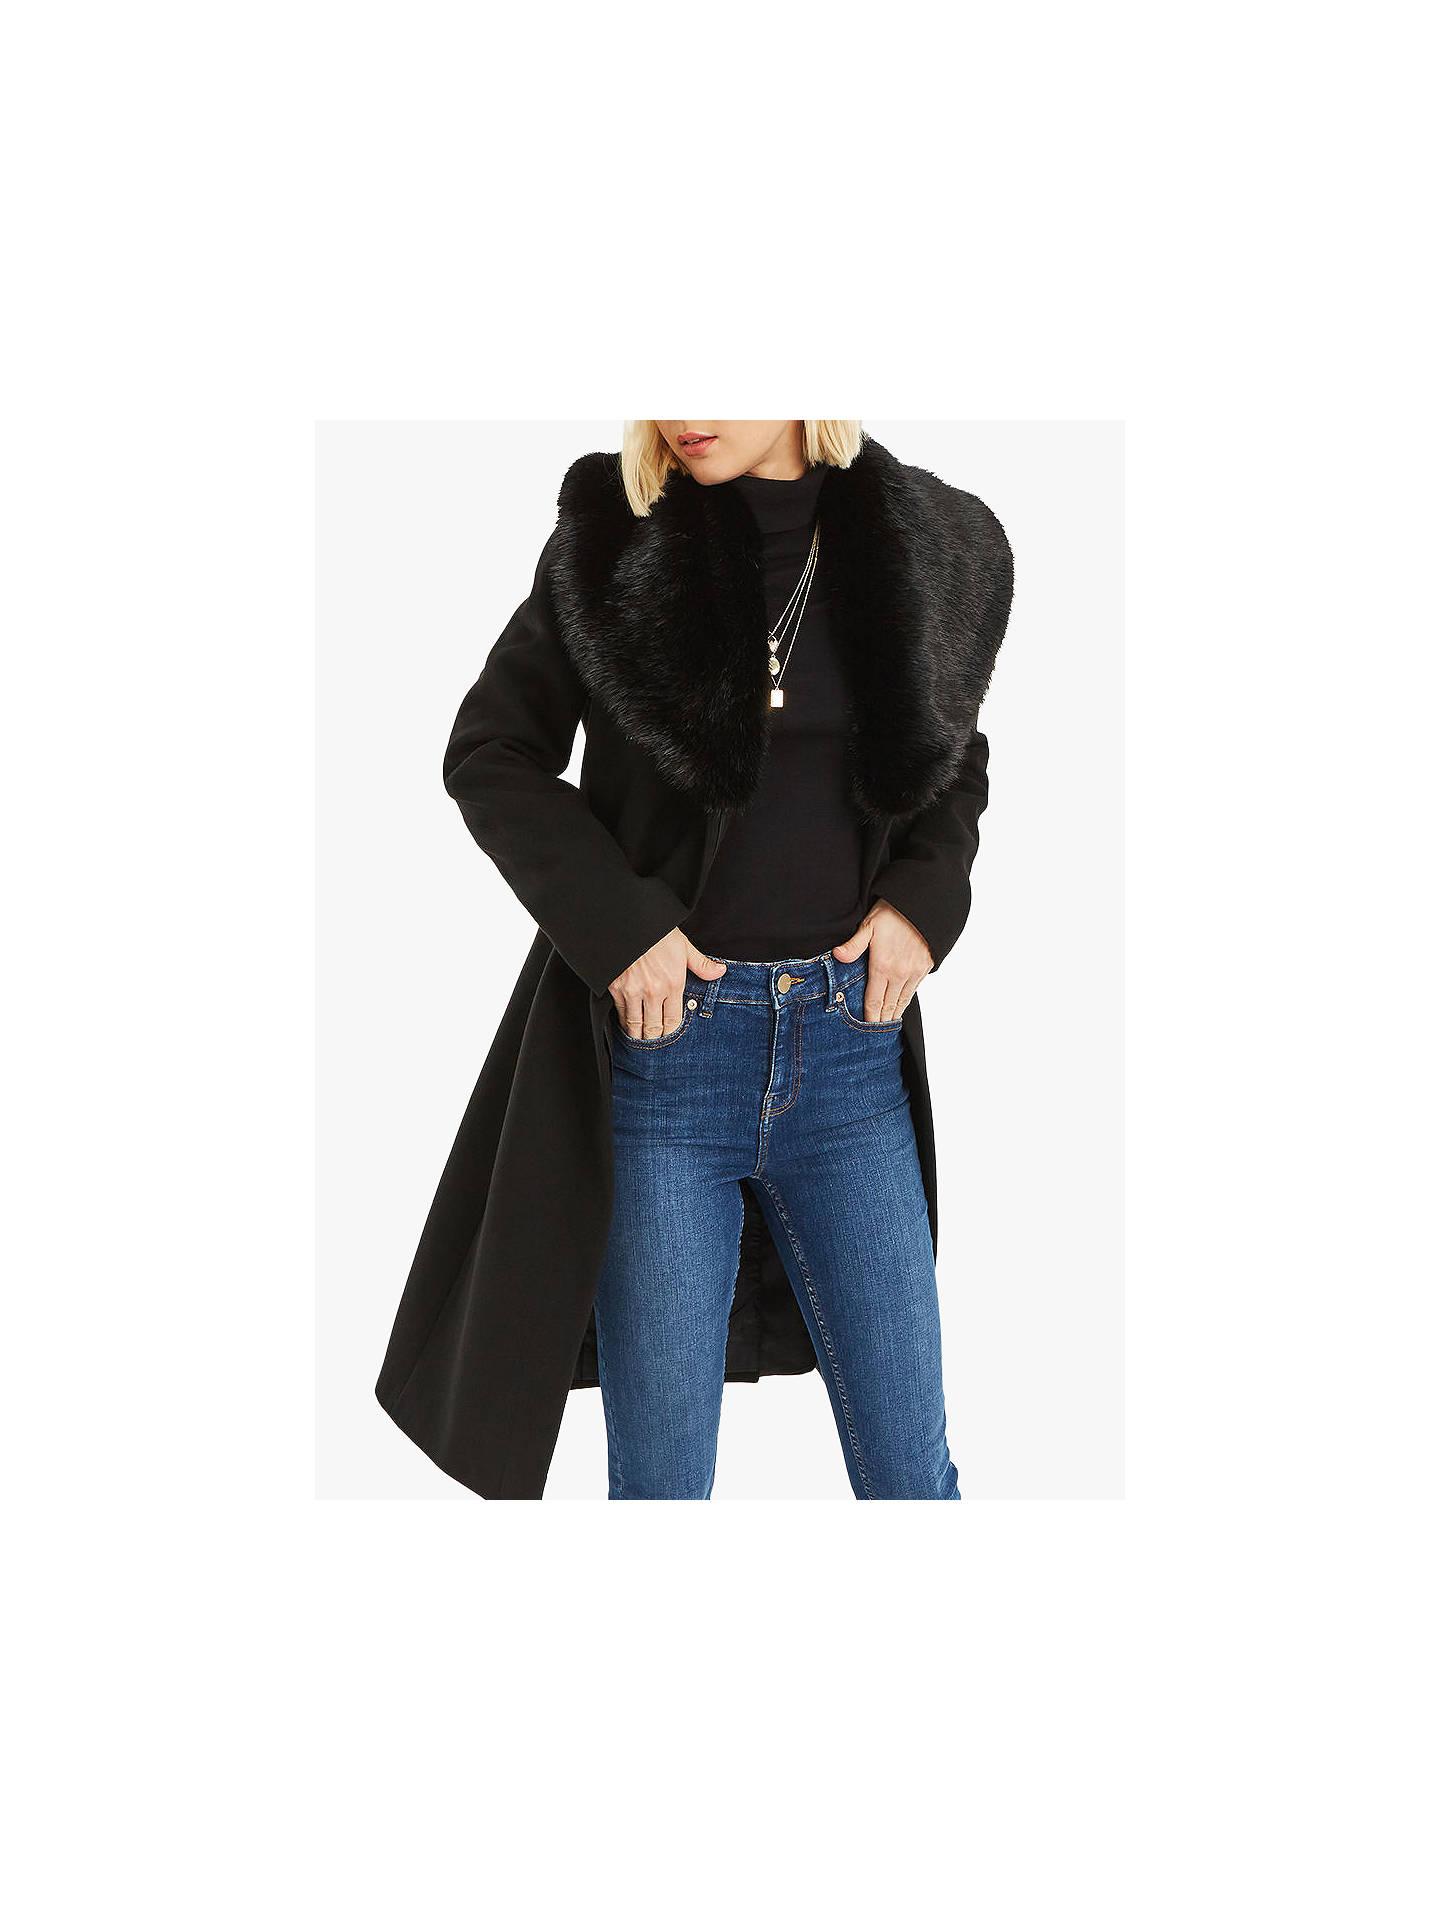 f9a3f6c44ae2 Buy Oasis Birch Faux Fur Trim Coat, Black, S Online at johnlewis.com ...